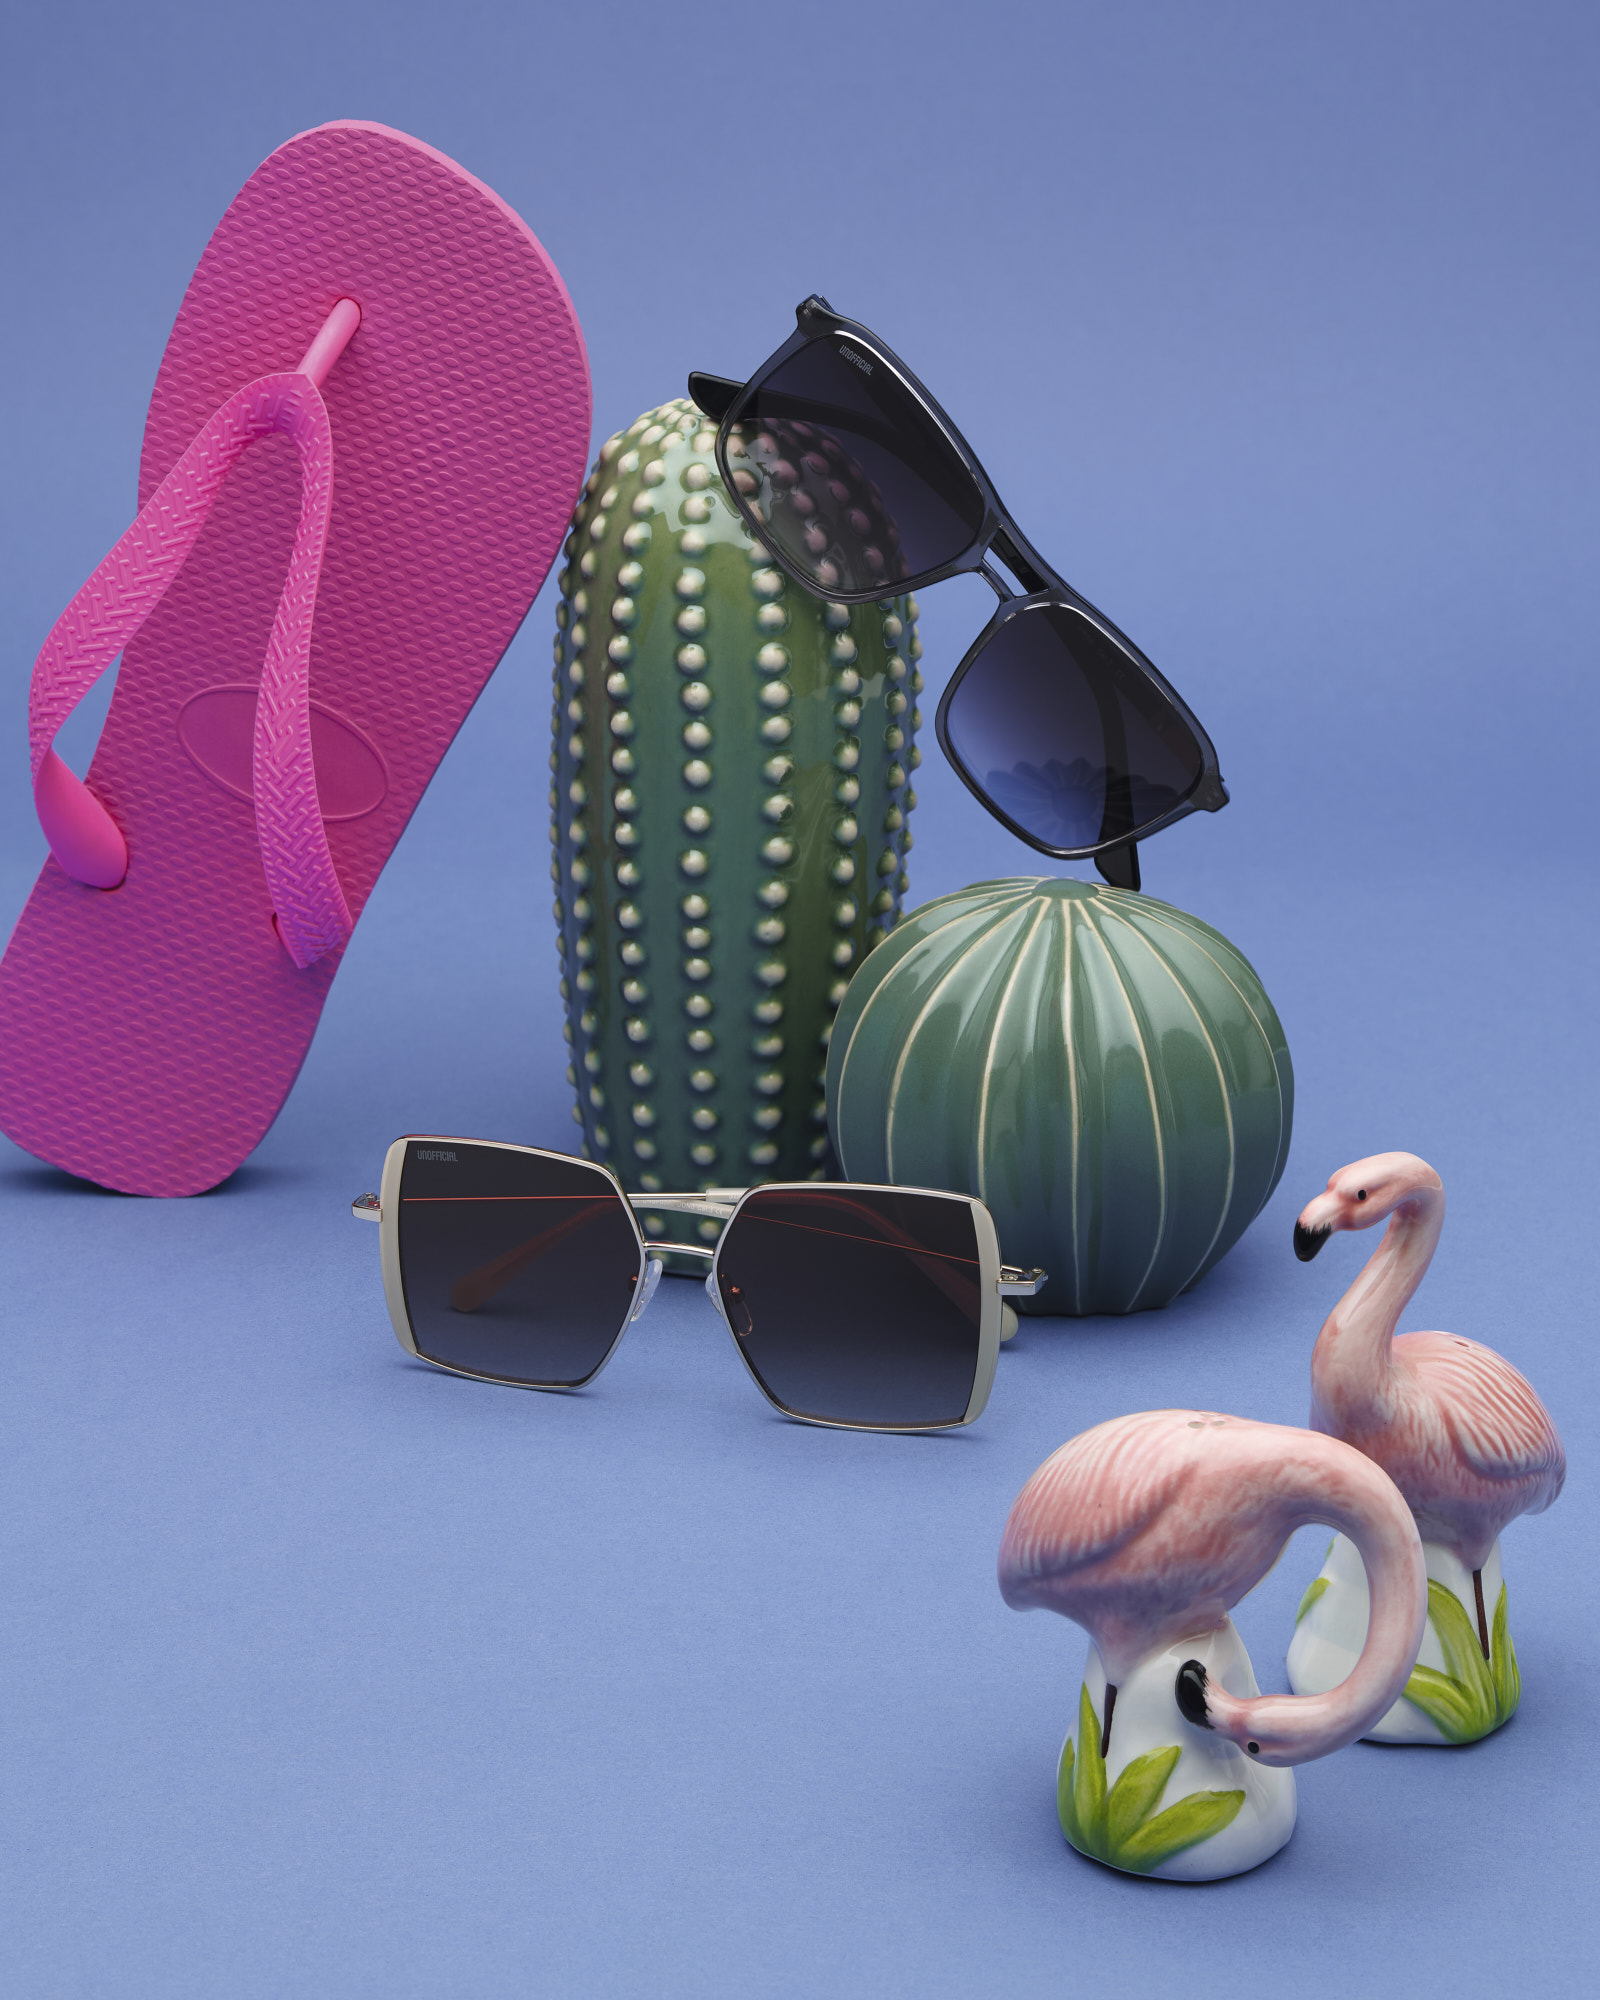 bernd-westphal-stillstars-apollo-optik-sunglasses-still-life-photography-001